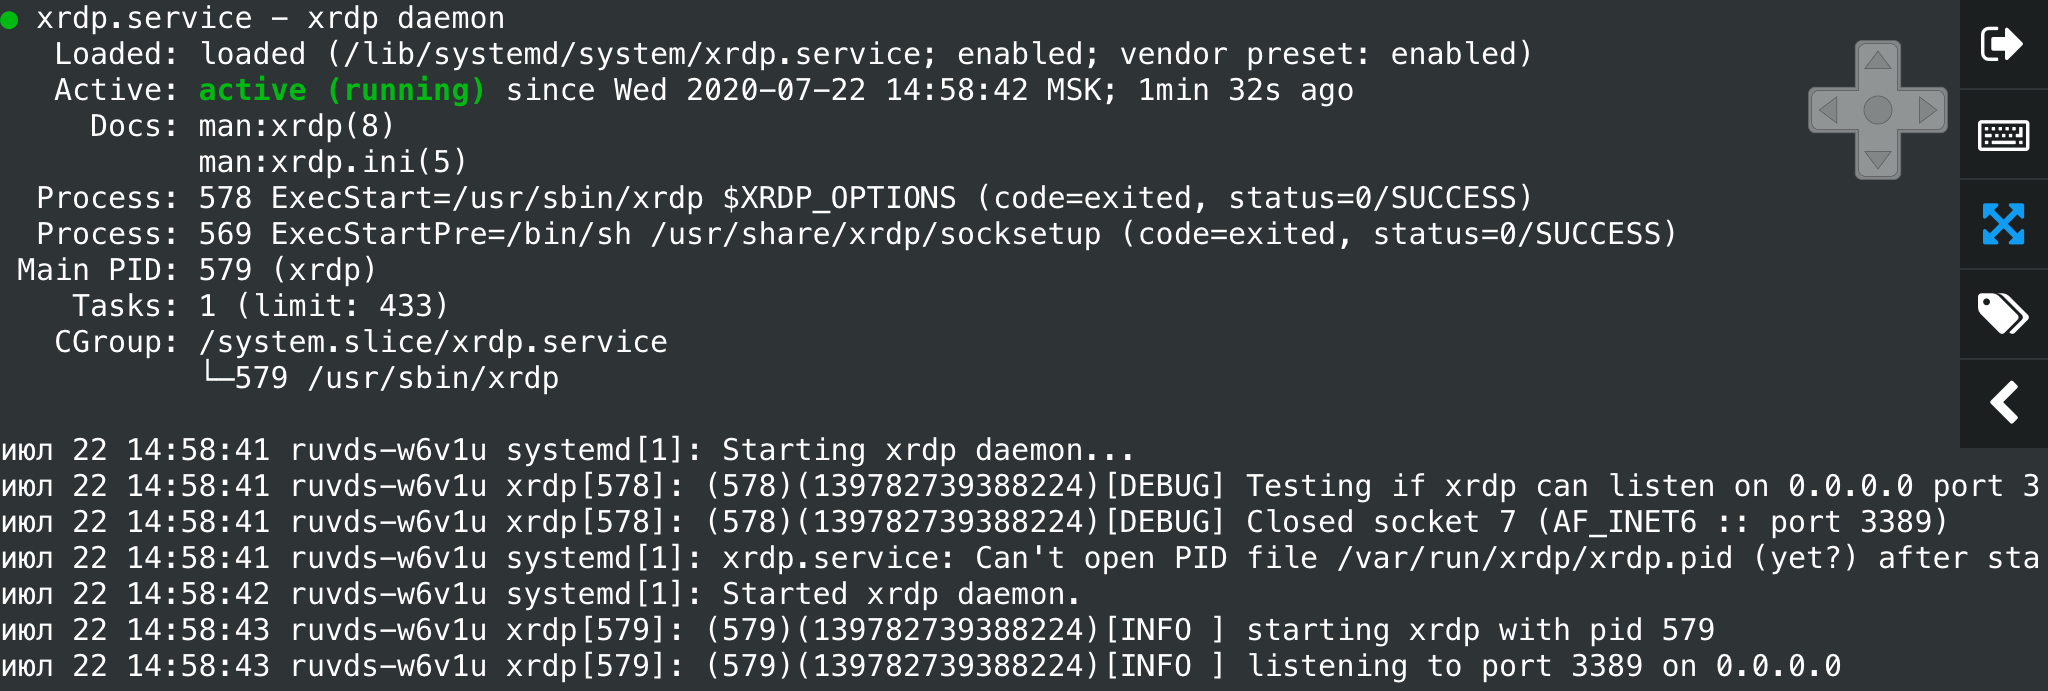 VPS на Linux с графическим интерфейсом: запускаем сервер RDP на Ubuntu 18.04 - 3